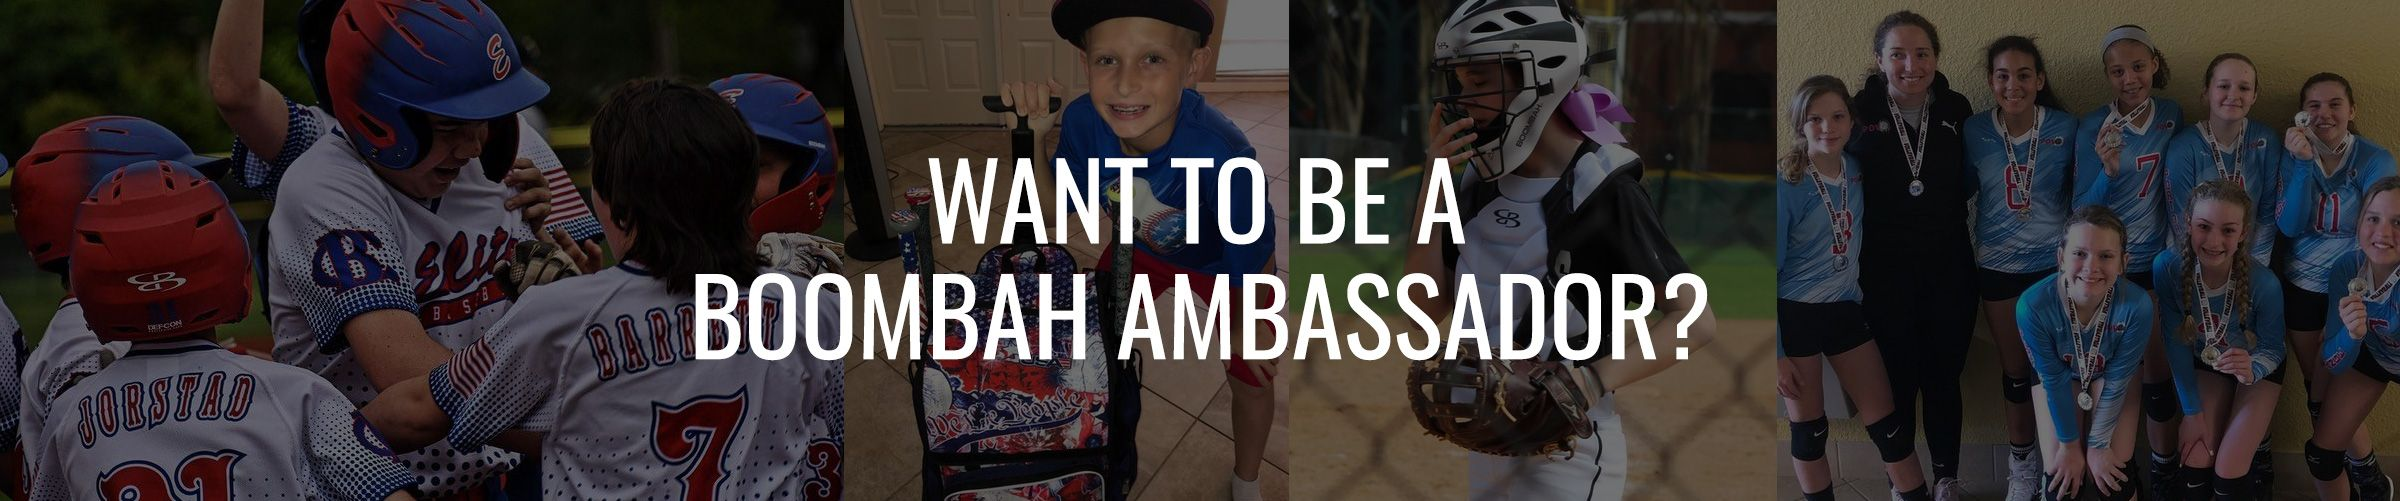 Become a Boombah Ambassador